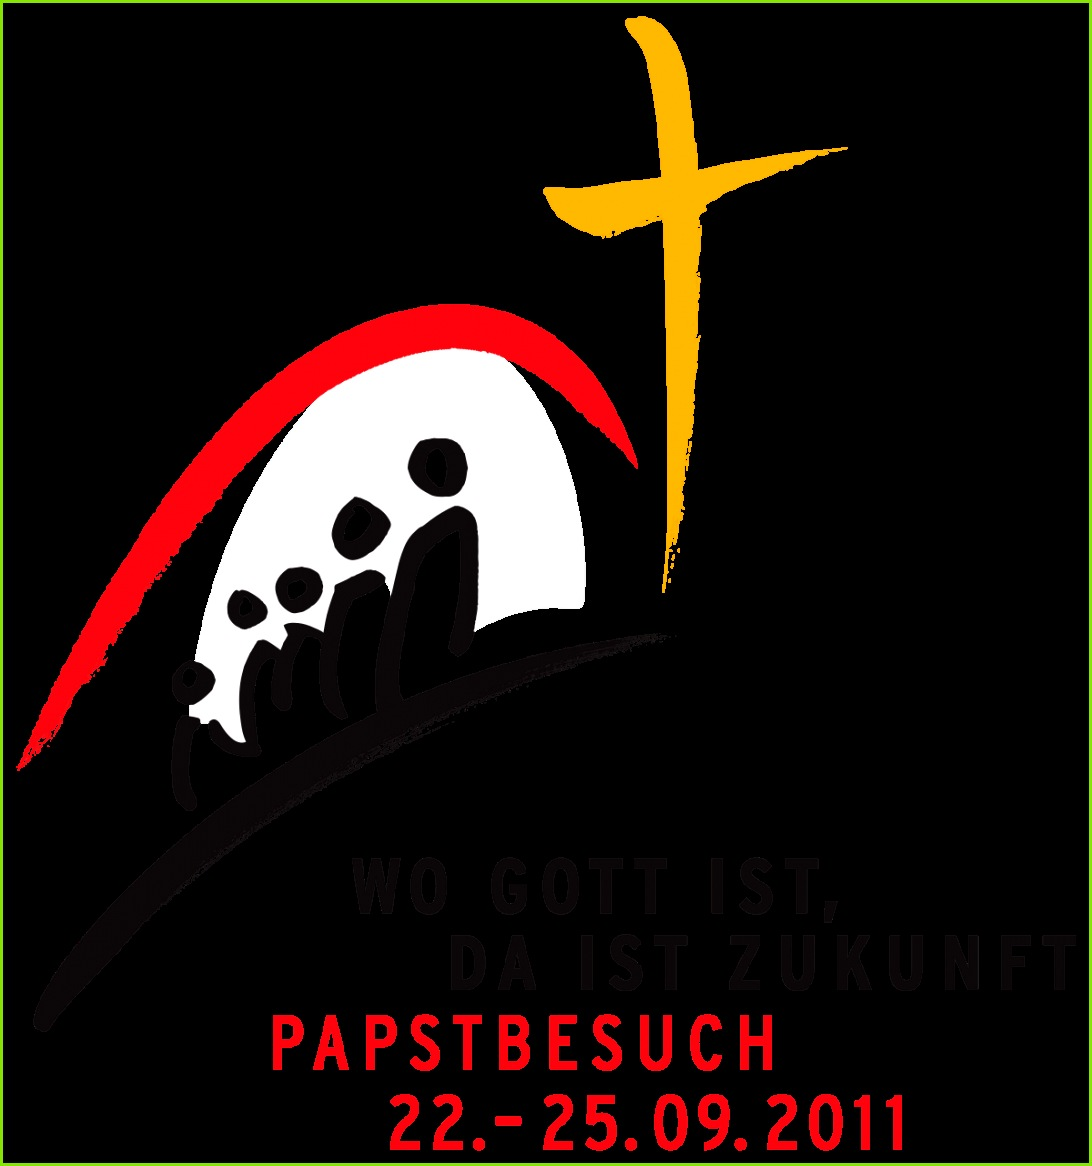 1200px Logo Papstbesuch 2011g